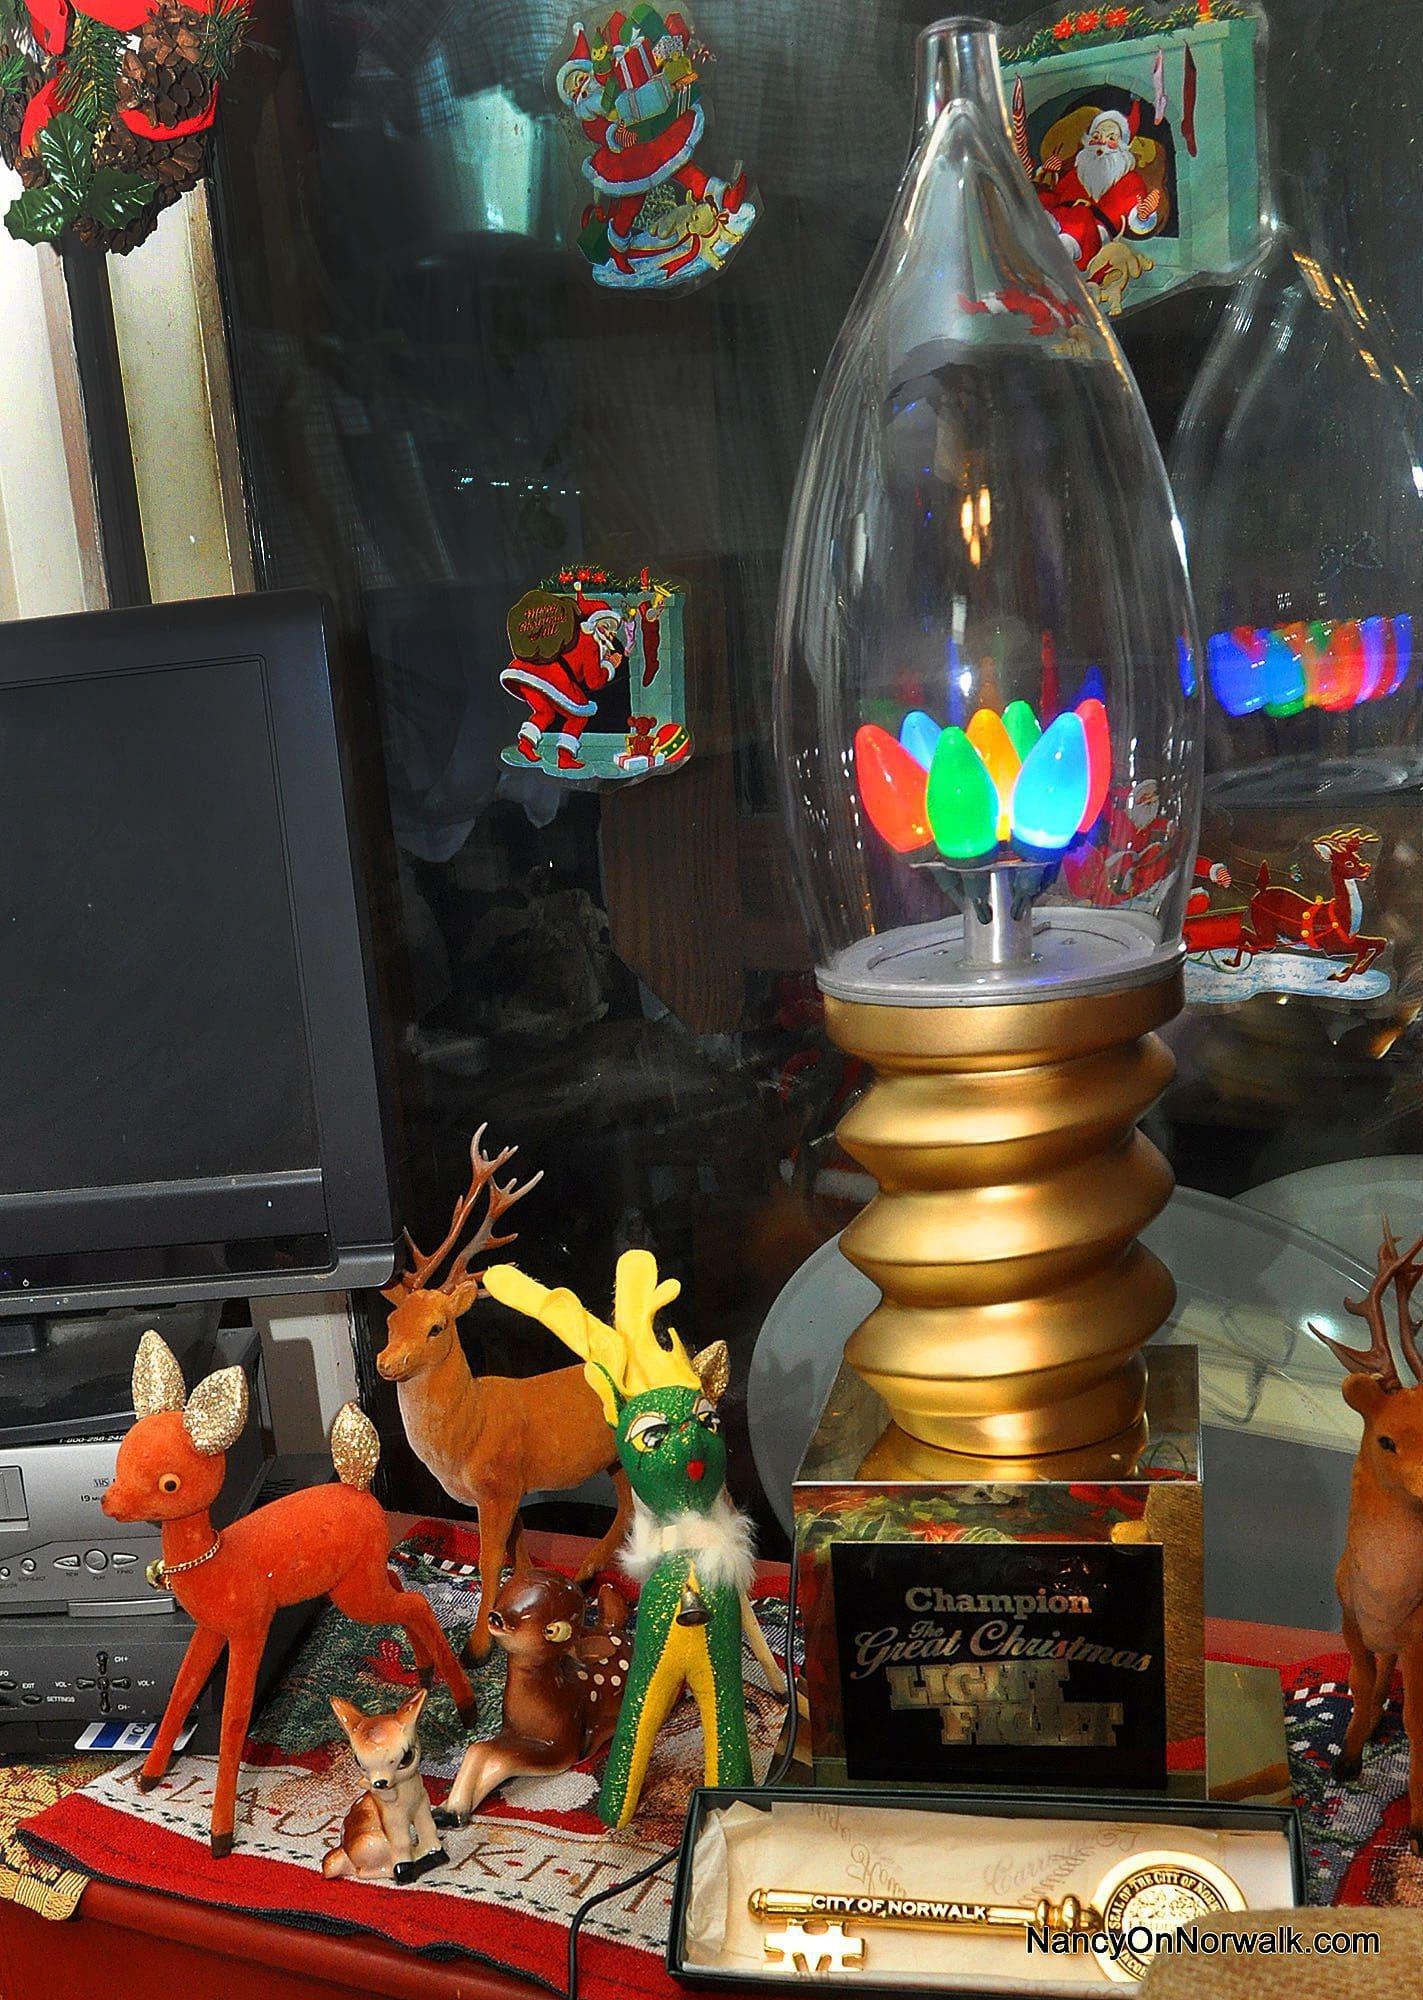 Settis Christmas Village wins ABCTVs Great Christmas